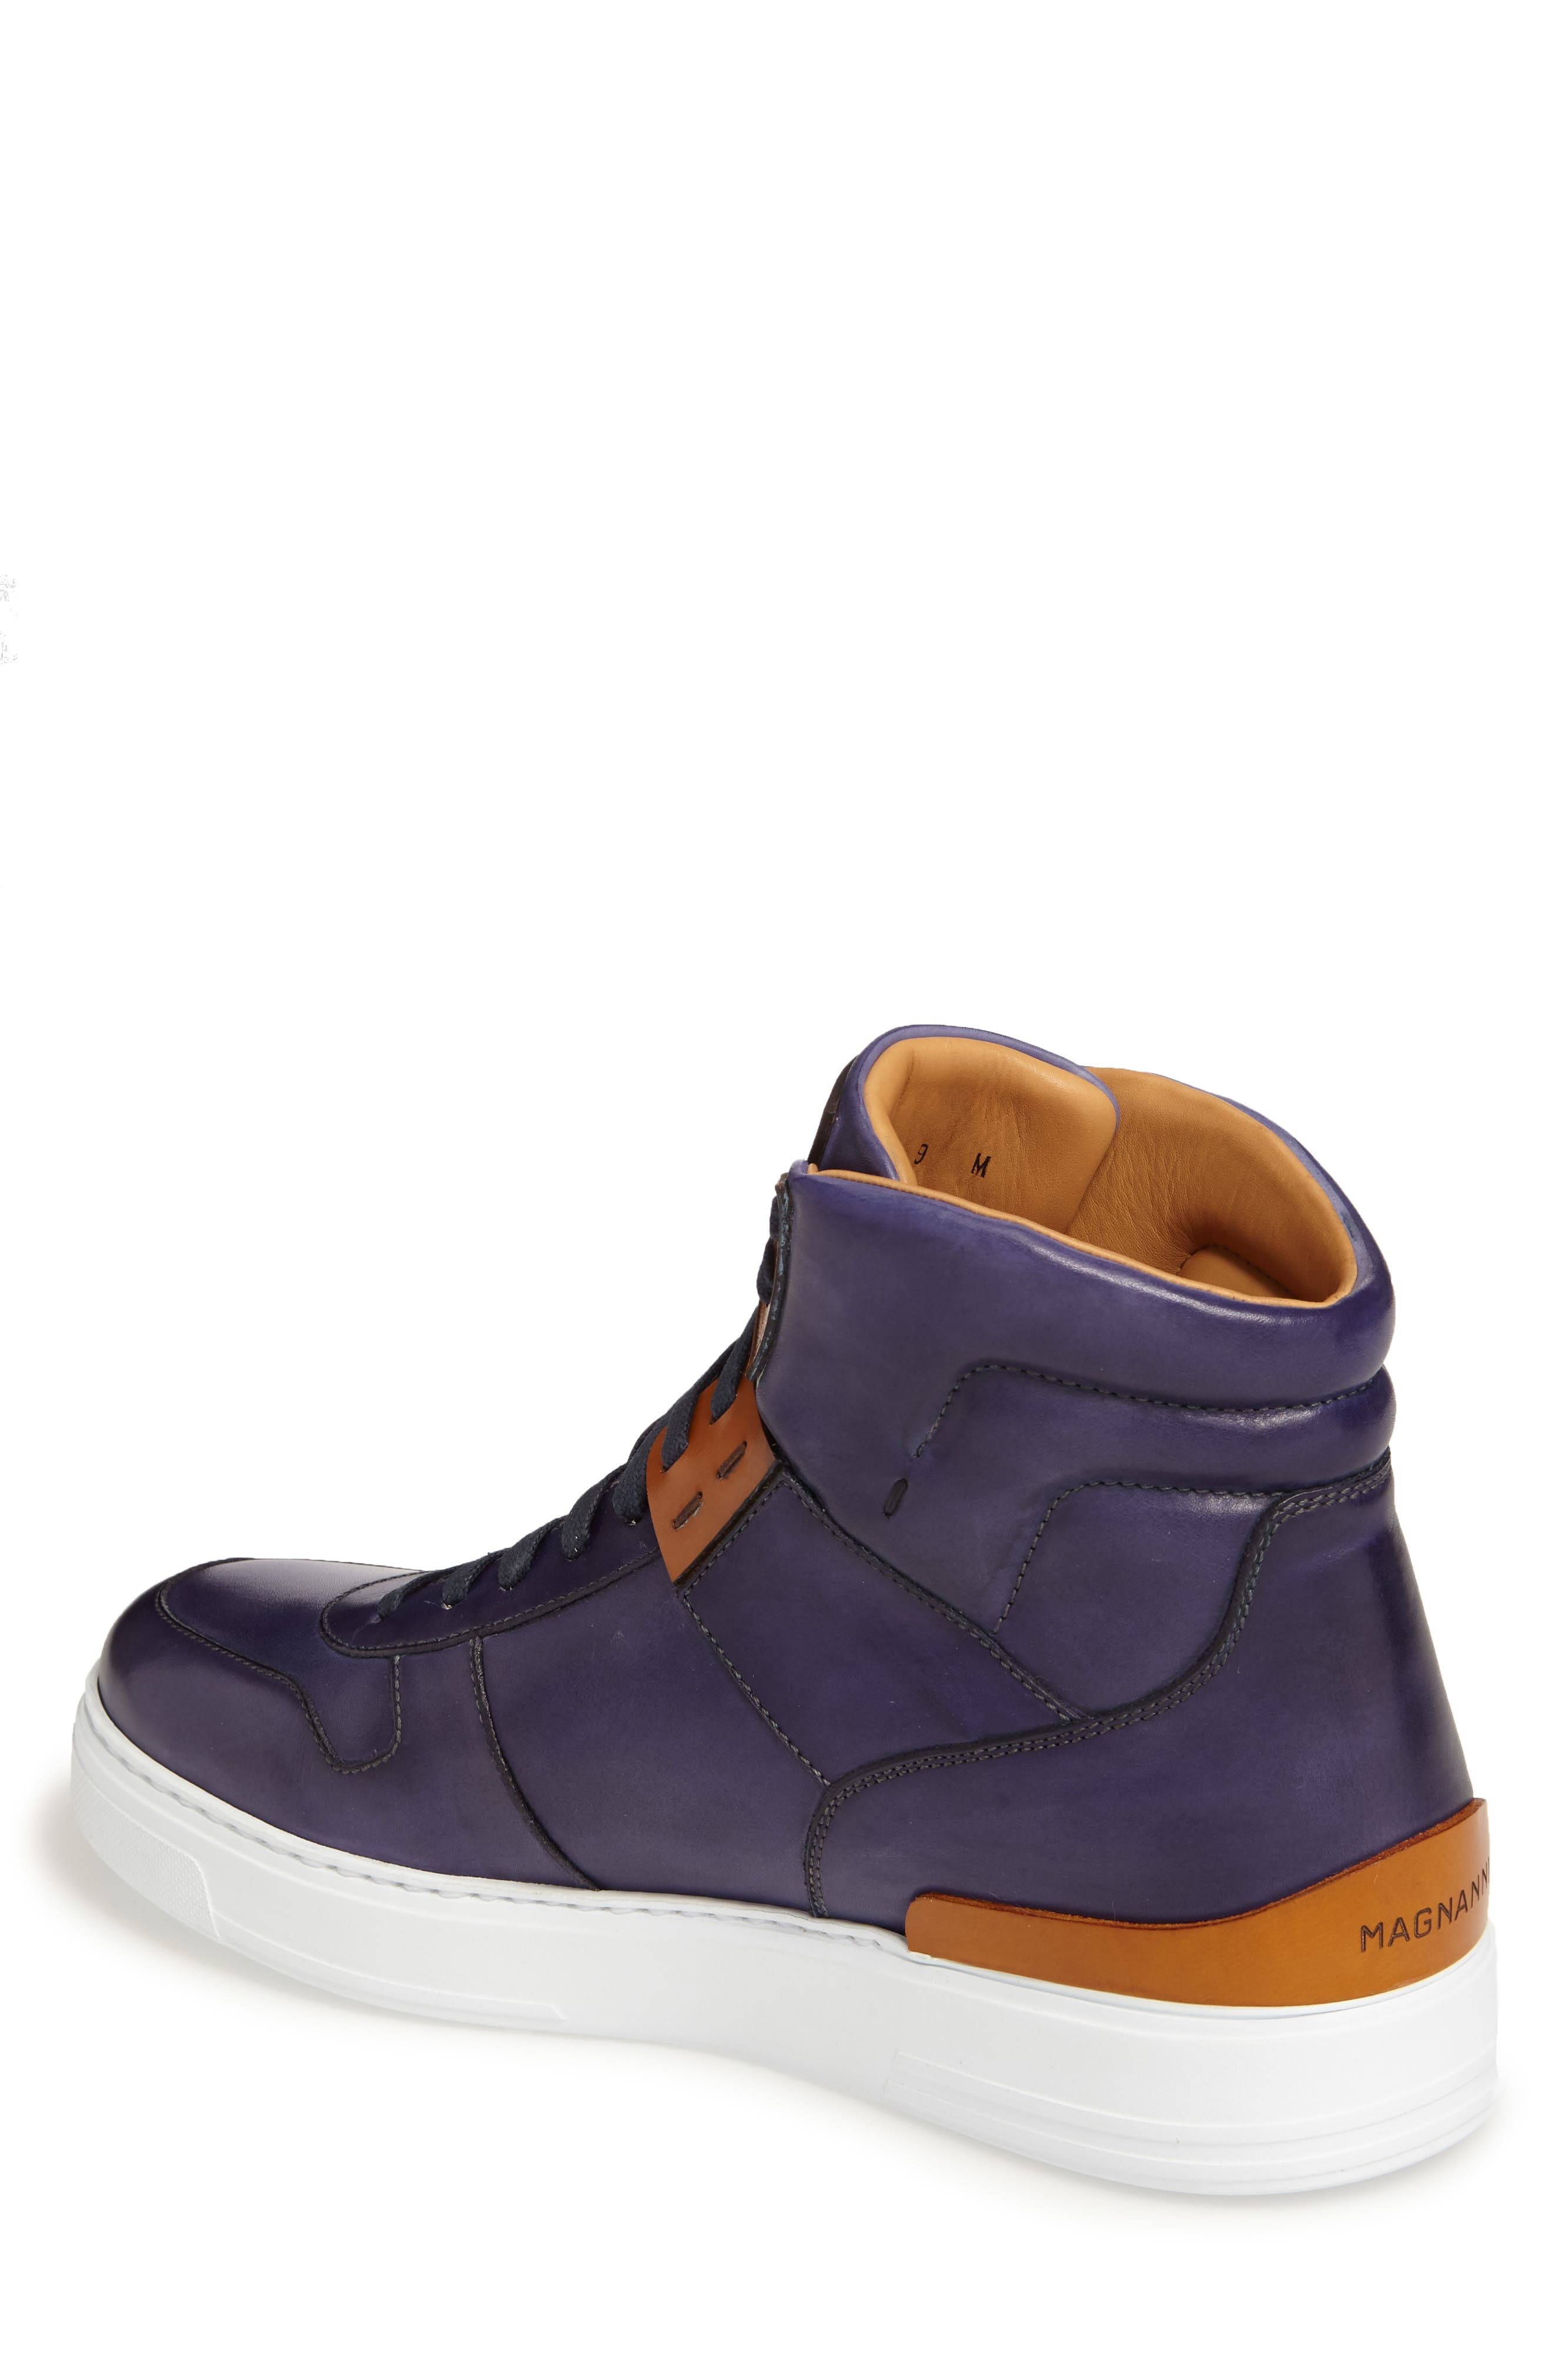 Endo Hi Sneaker,                             Alternate thumbnail 2, color,                             Navy Leather